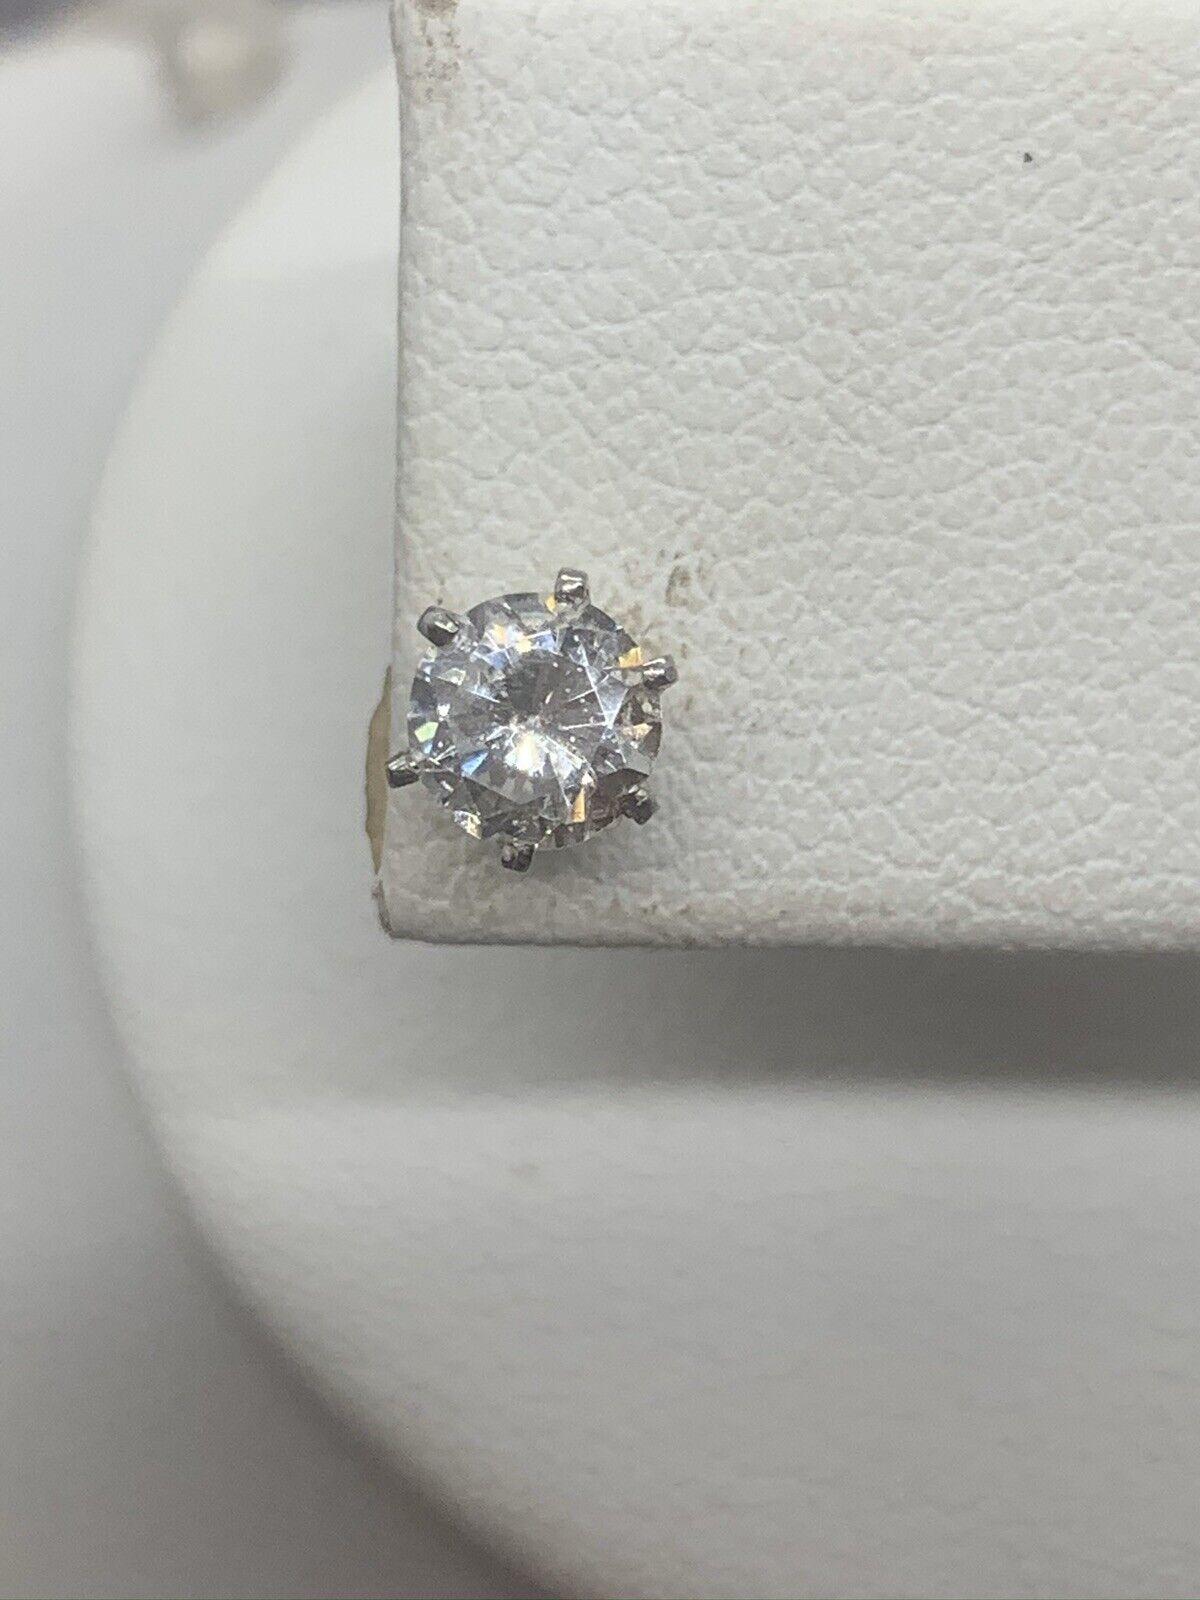 Vinatge Signed Monet Crystal Stud Earrings - image 2